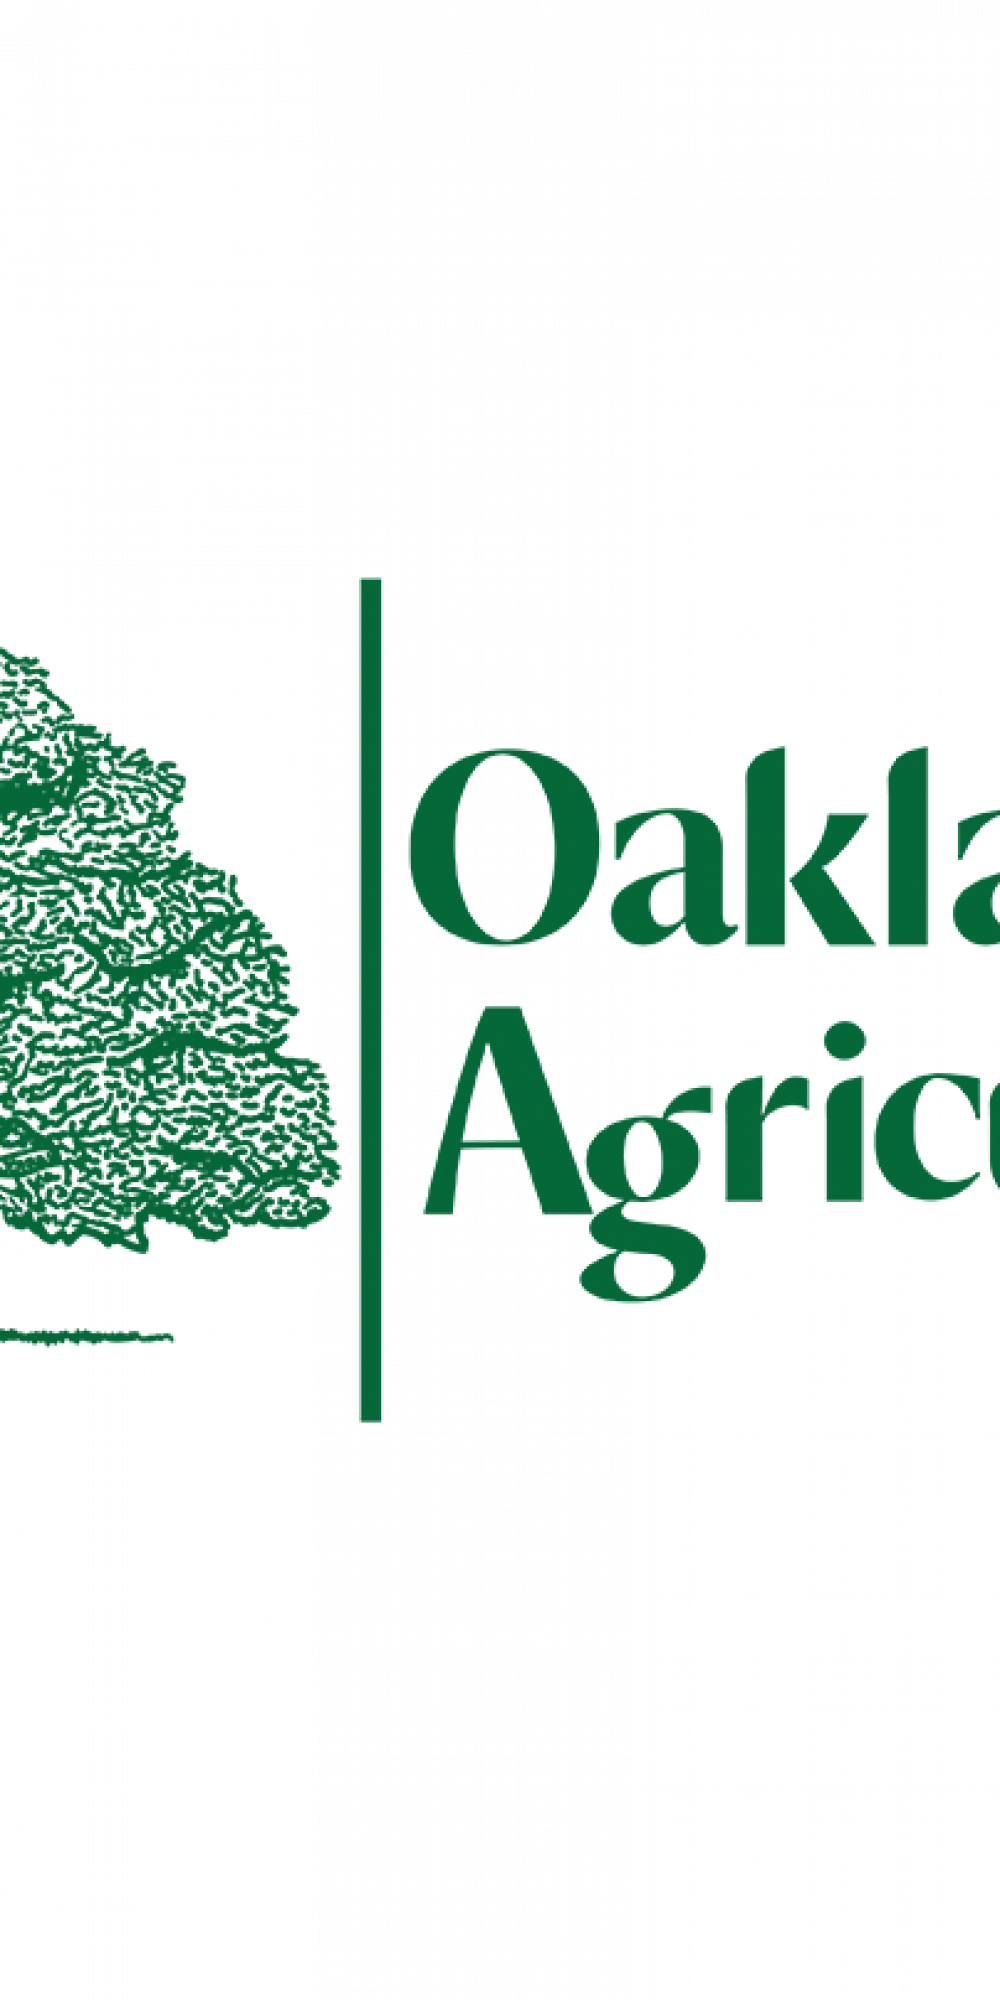 Oakland Agriculture Dubai